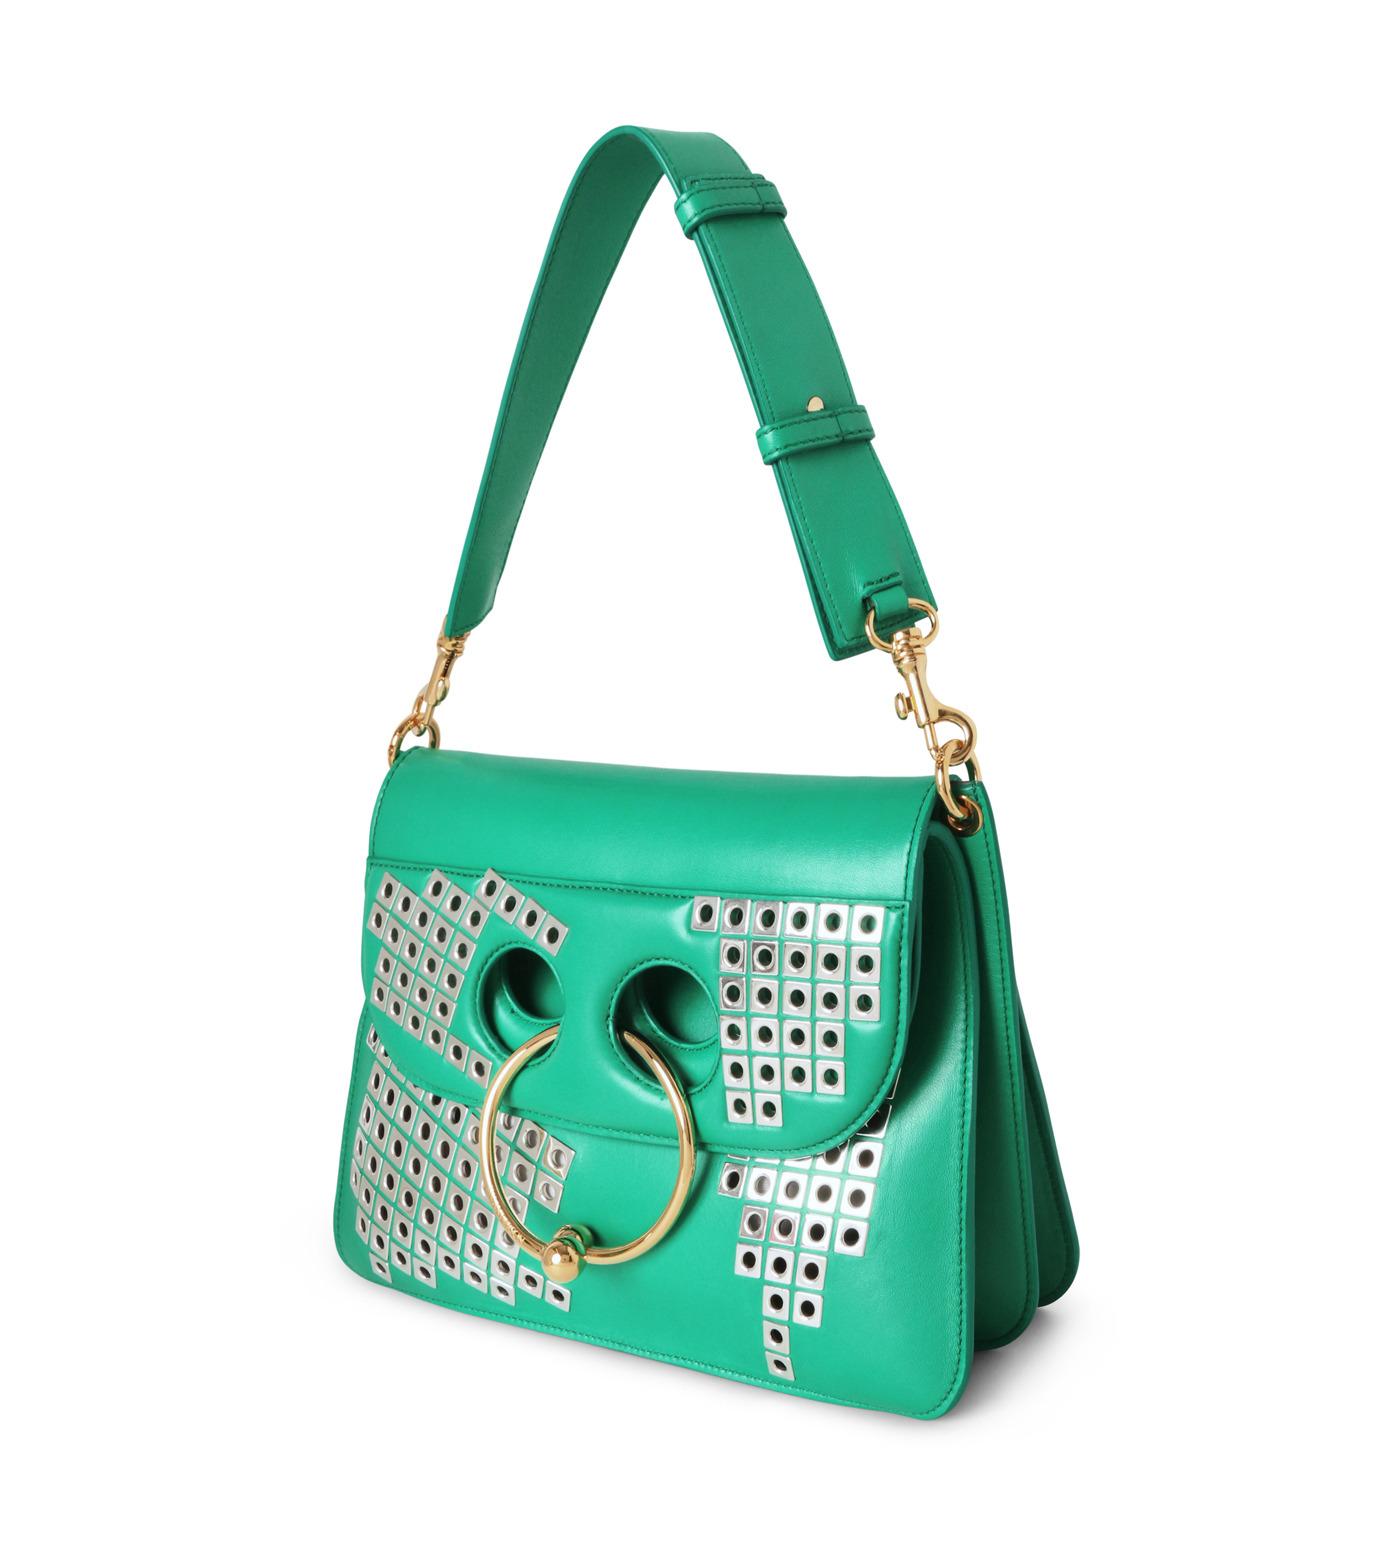 J.W.Anderson(ジェイダブリュー アンダーソン)のMedium Piearc Bag w/Studs-GREEN(ショルダーバッグ/shoulder bag)-HB10-22 拡大詳細画像2